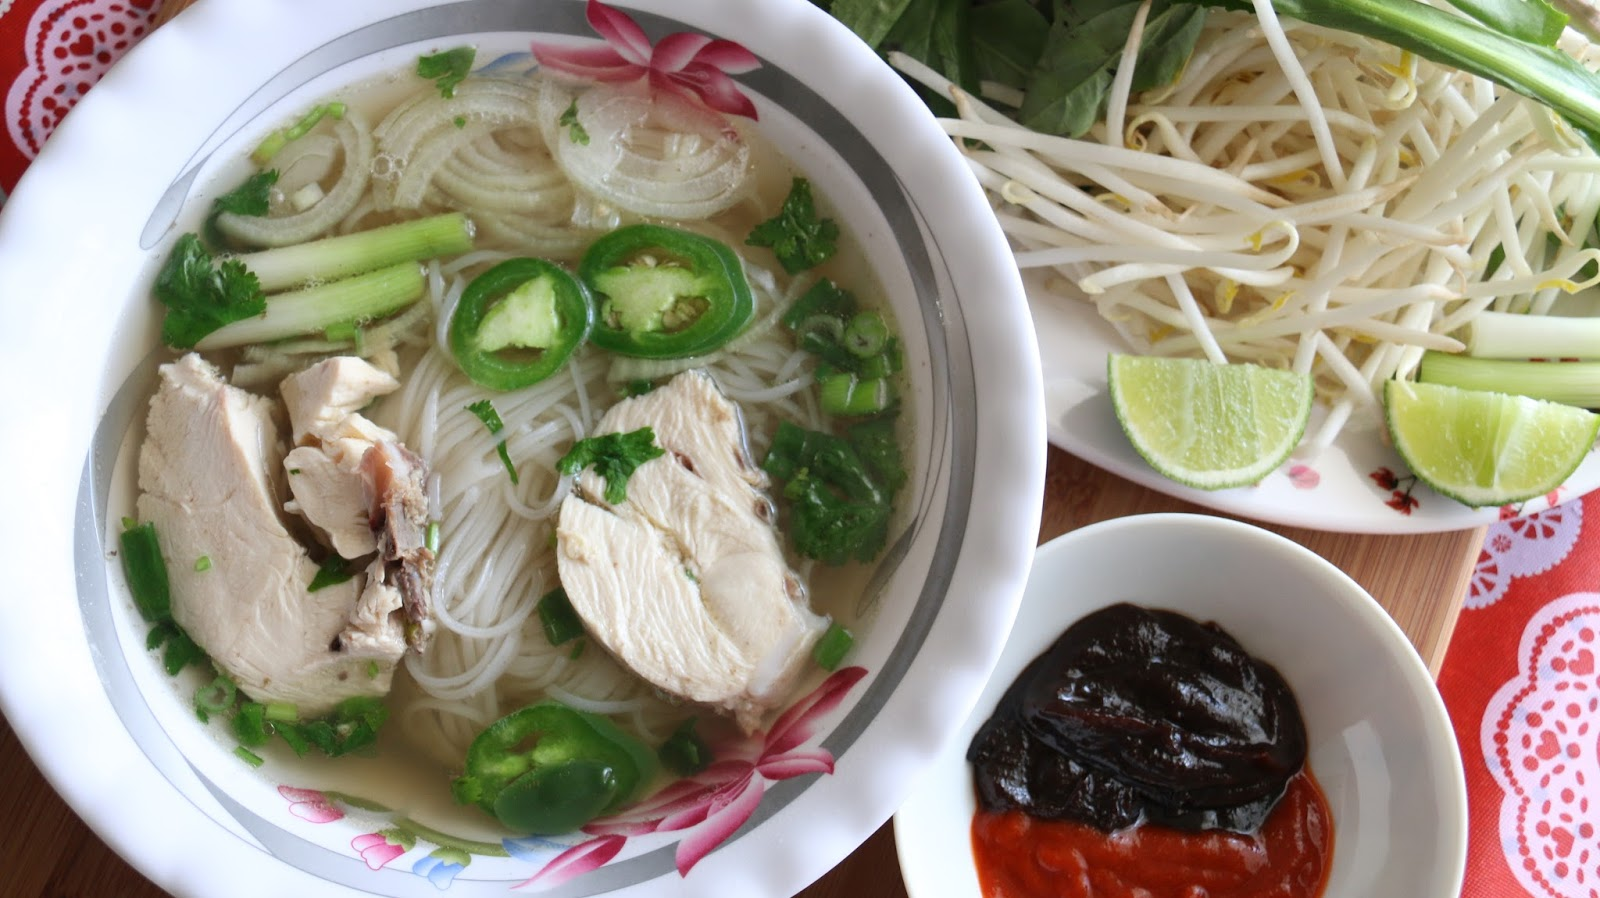 Boriville: Pho Ga (Vietnamese Chicken Noodle Soup)